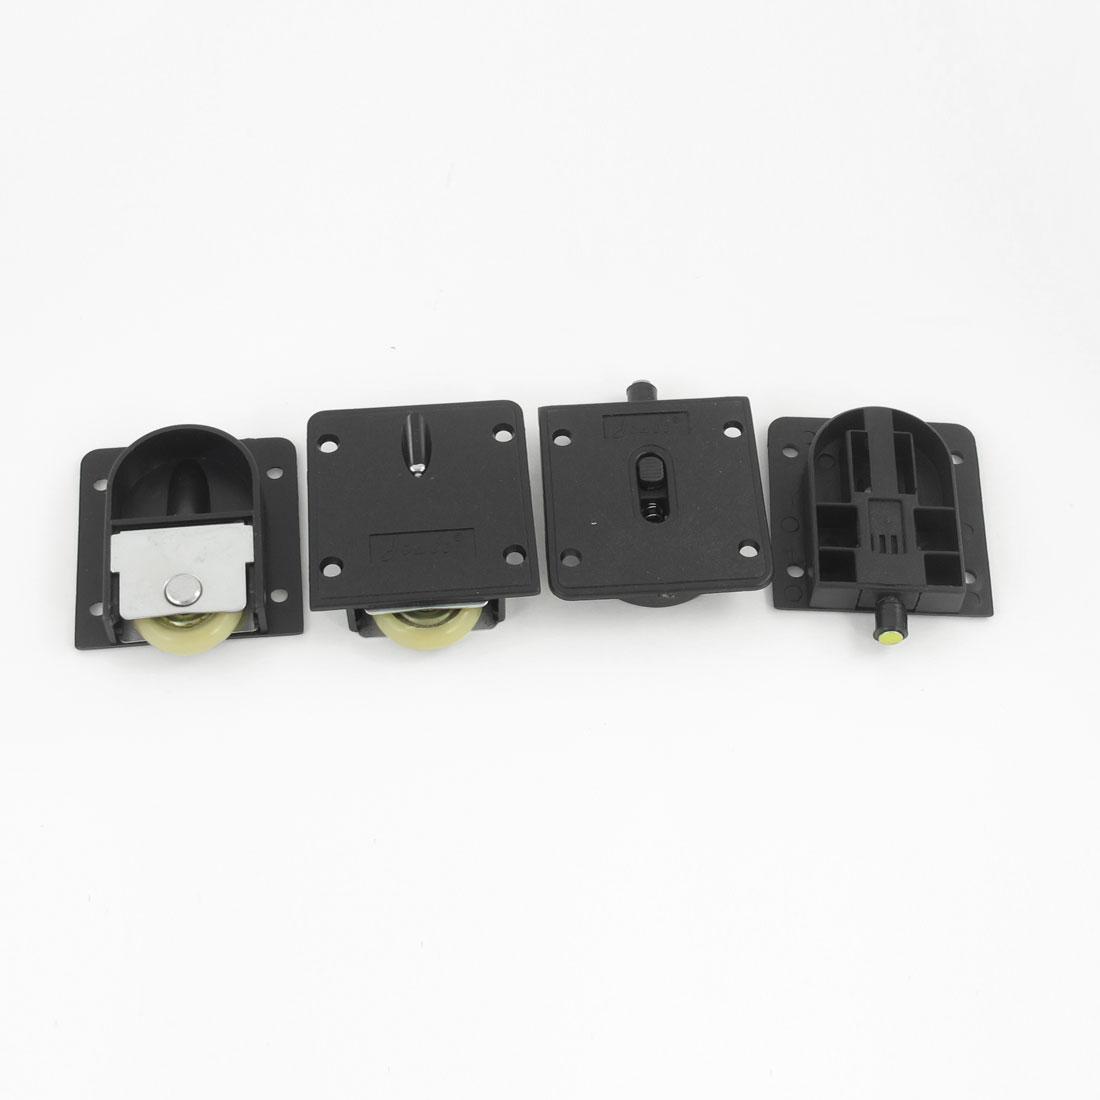 2 Set Wardrobe Component Black Plastic Plate 25mm Dia Wheel Sliding Door Roller